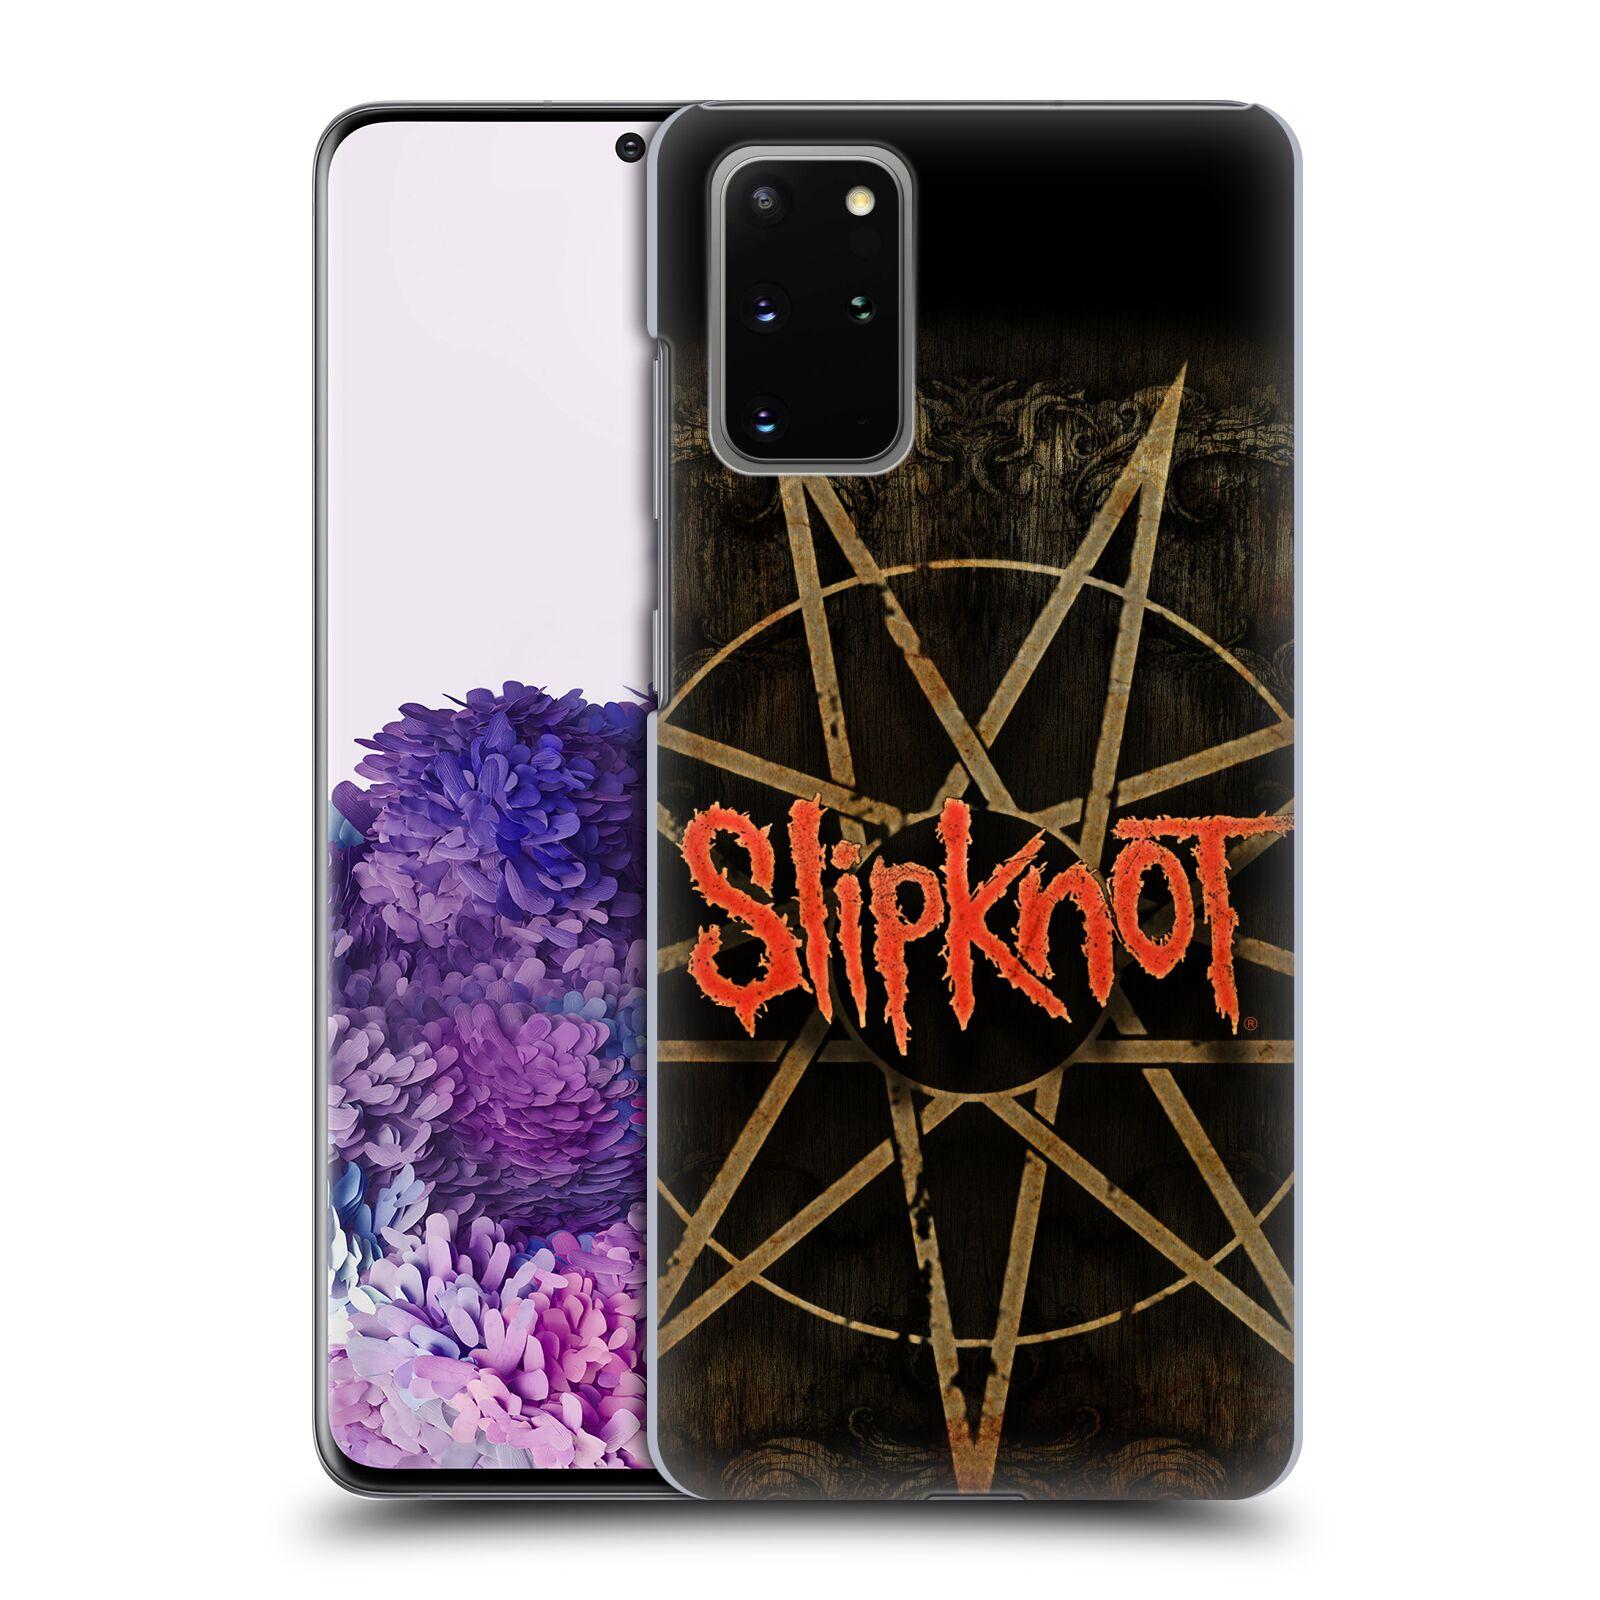 Plastové pouzdro na mobil Samsung Galaxy S20 Plus - Head Case - Slipknot - Znak